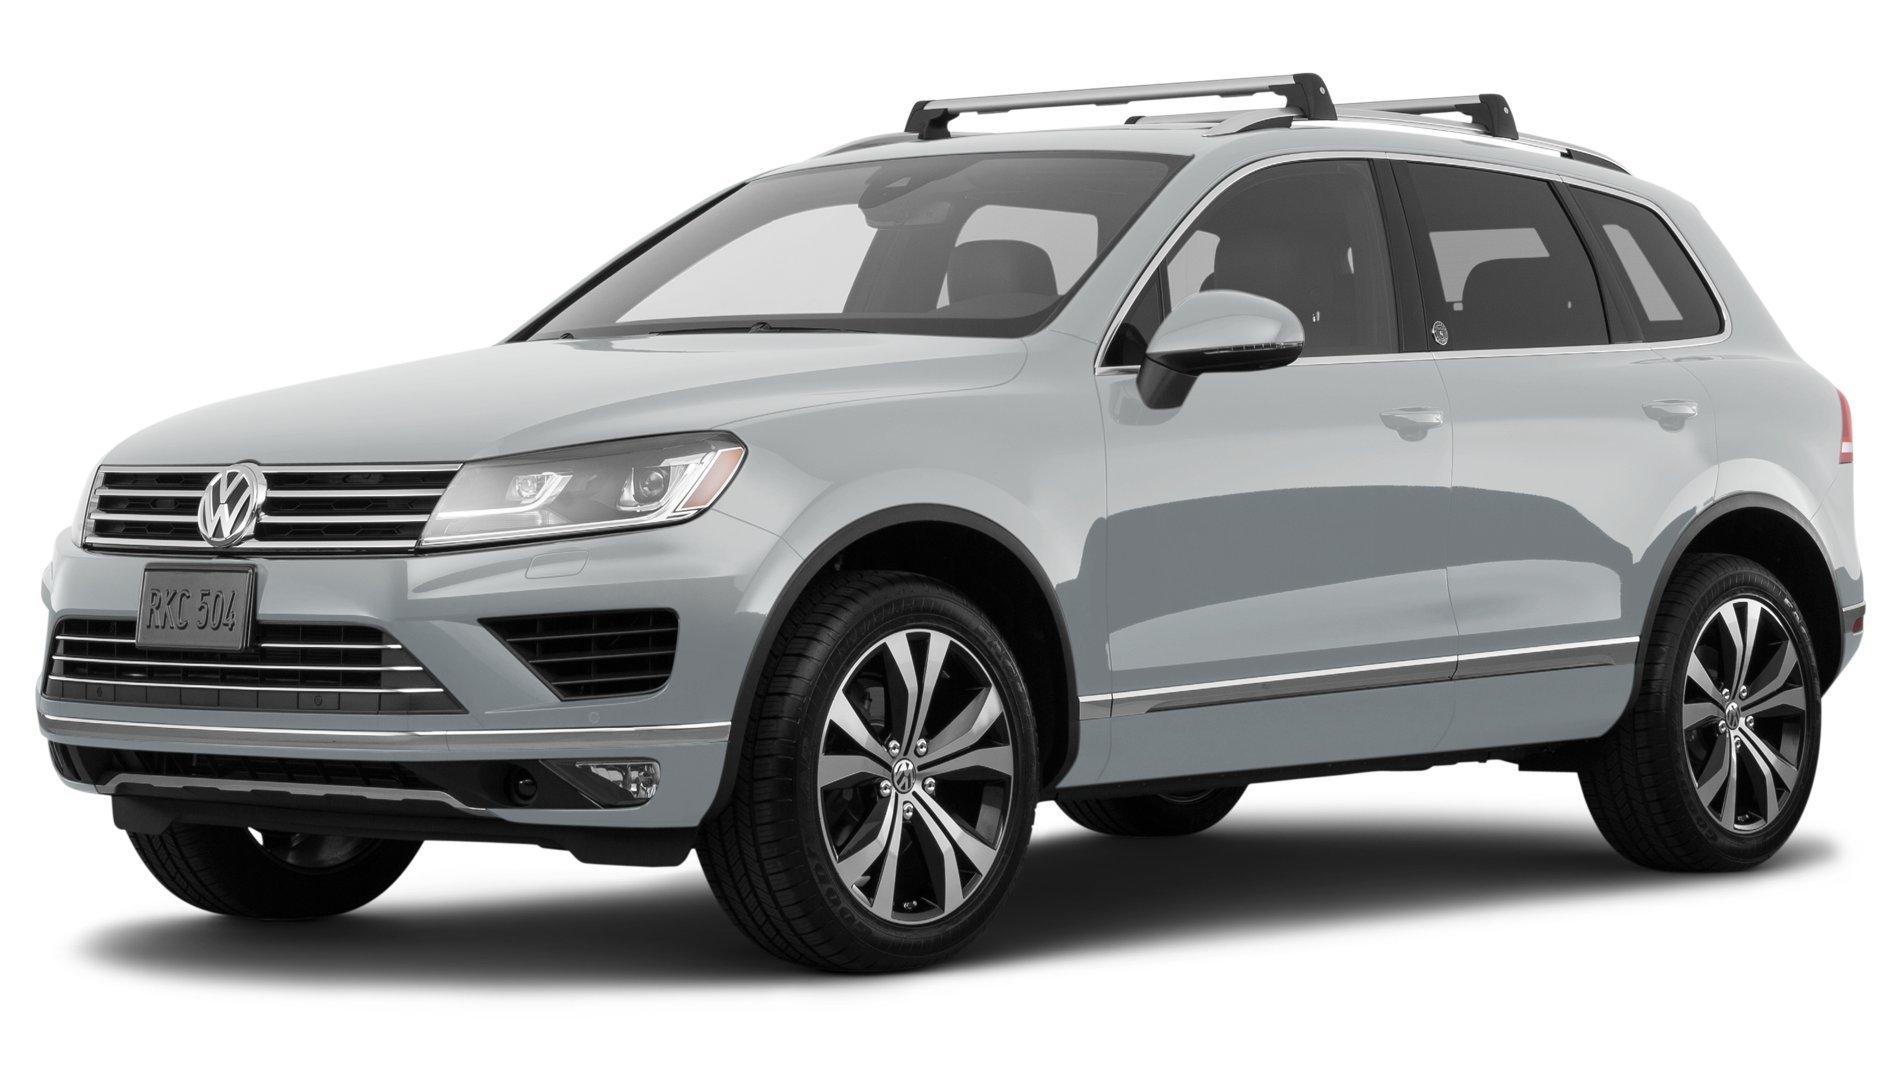 ... 2017 Volkswagen Touareg Executive, V6 ...